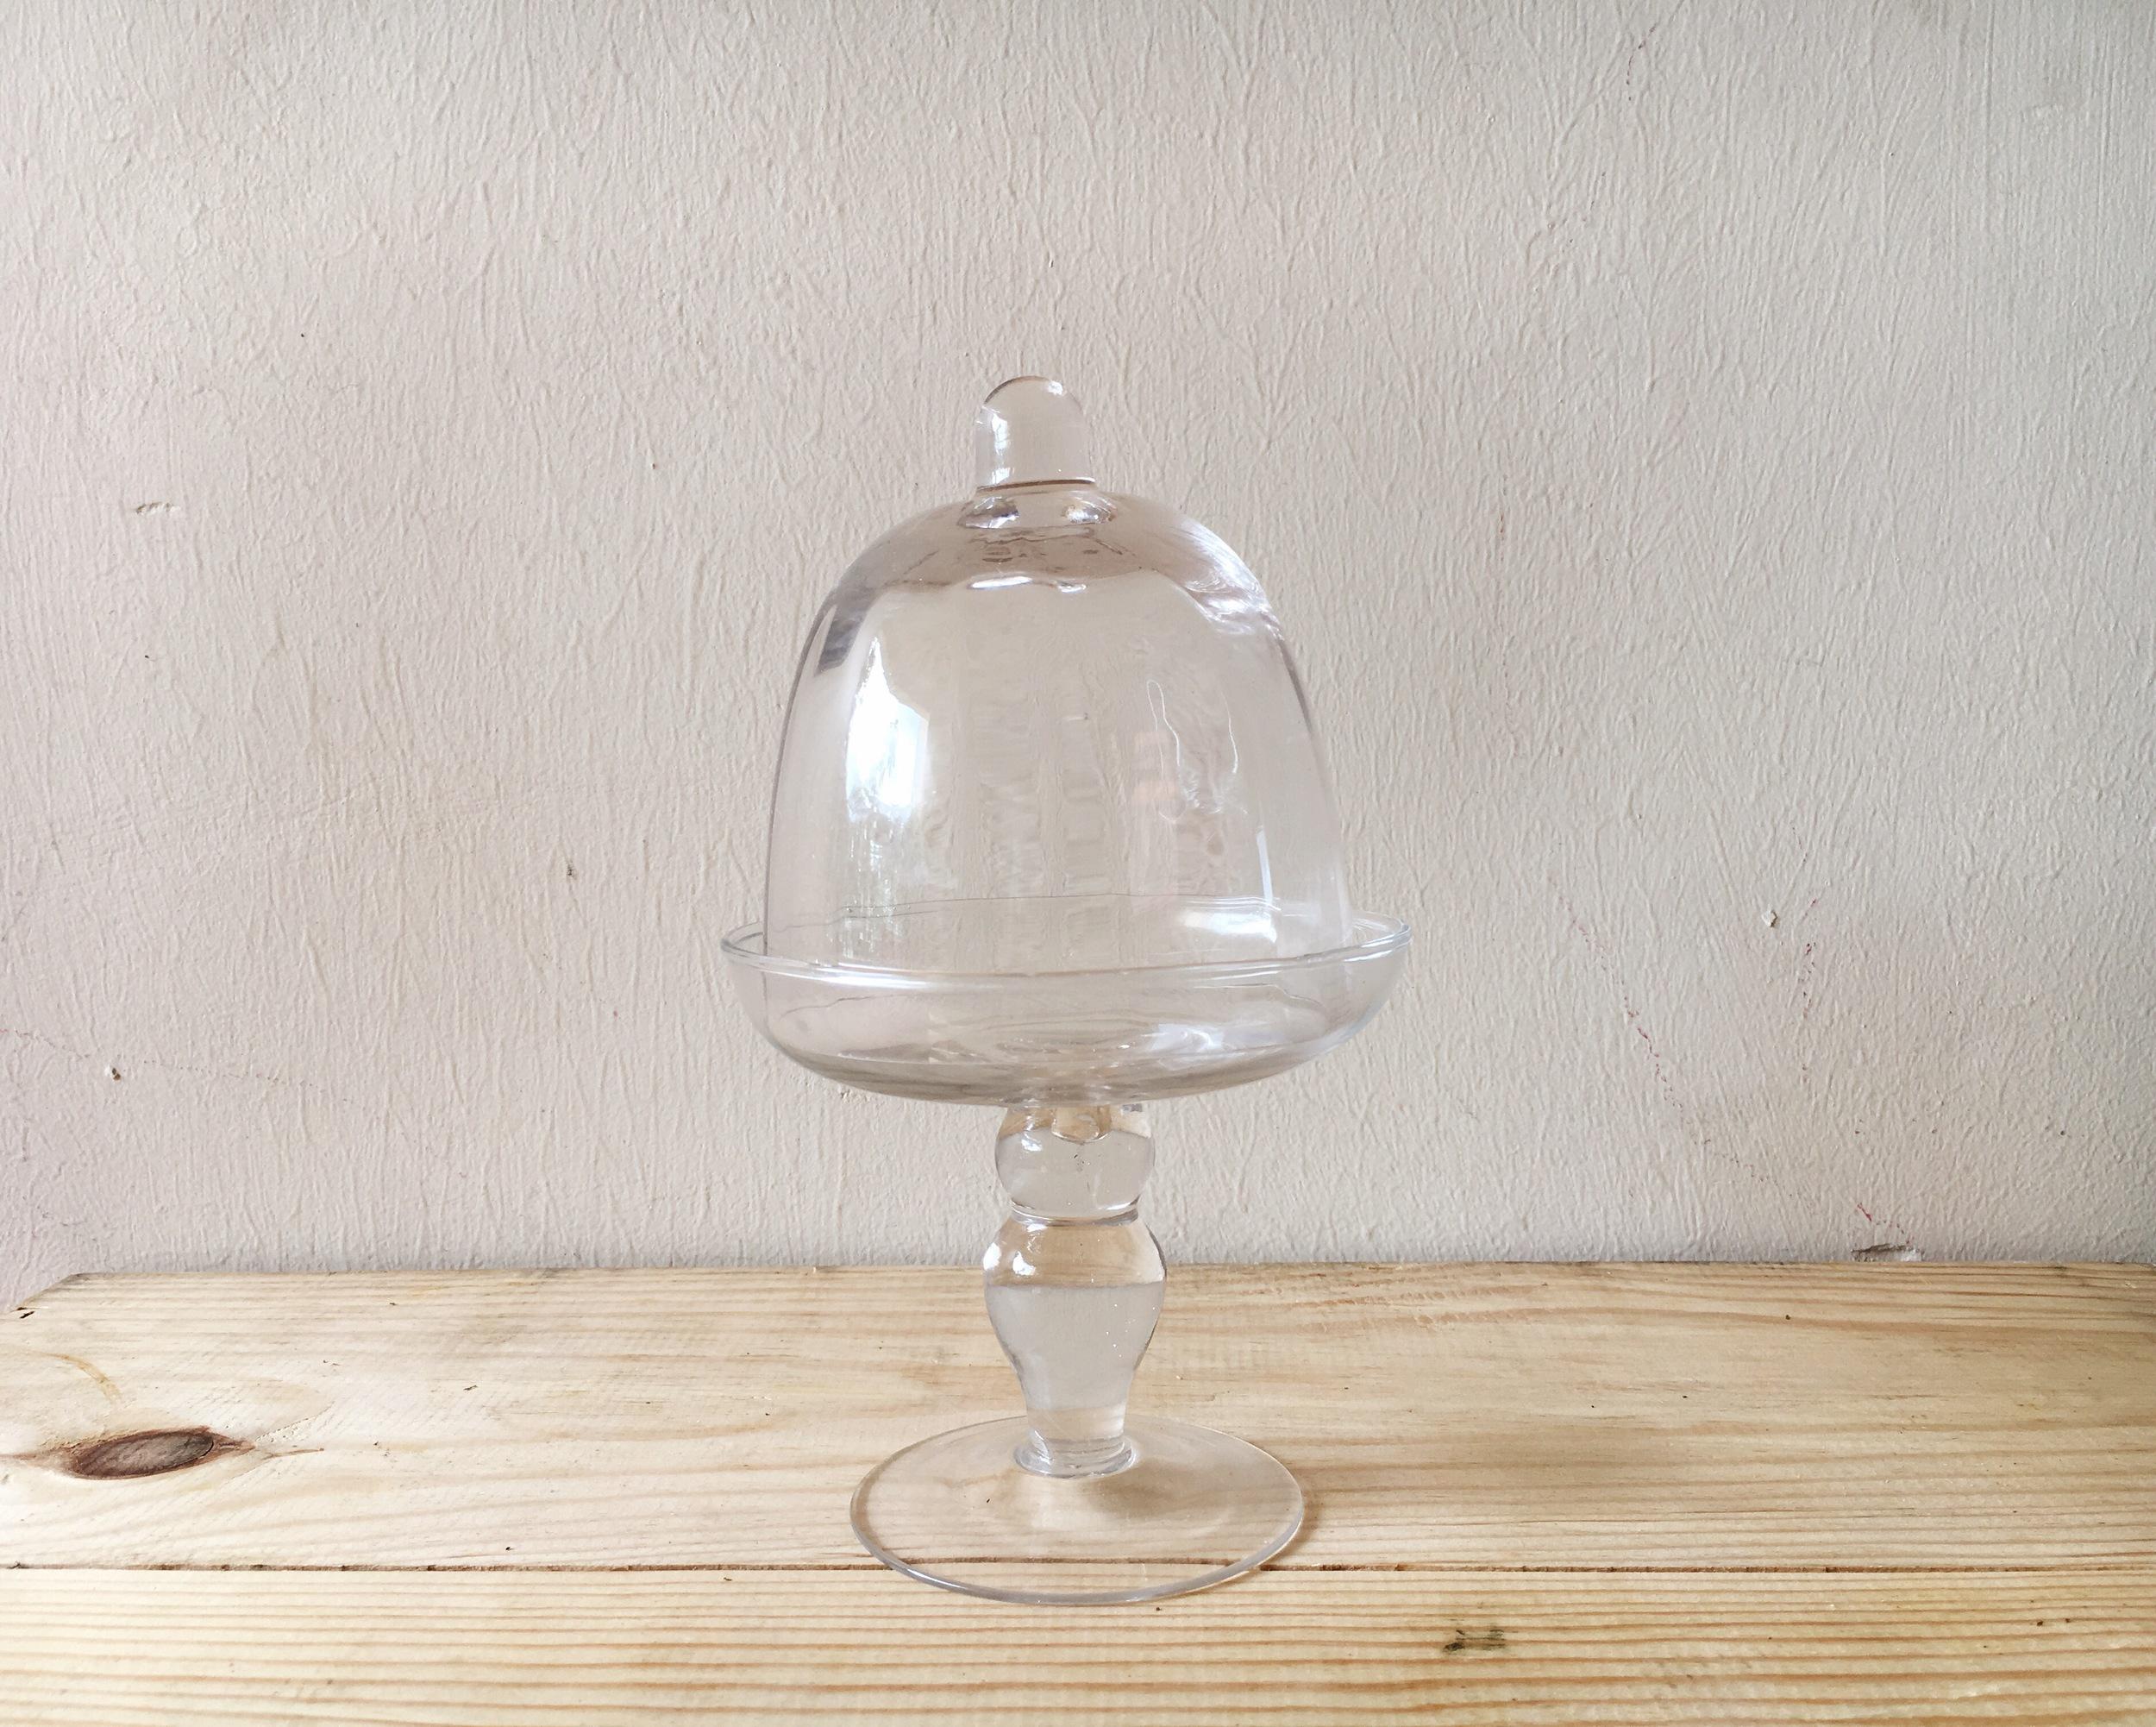 DT09 Small Glass Dessert Stand